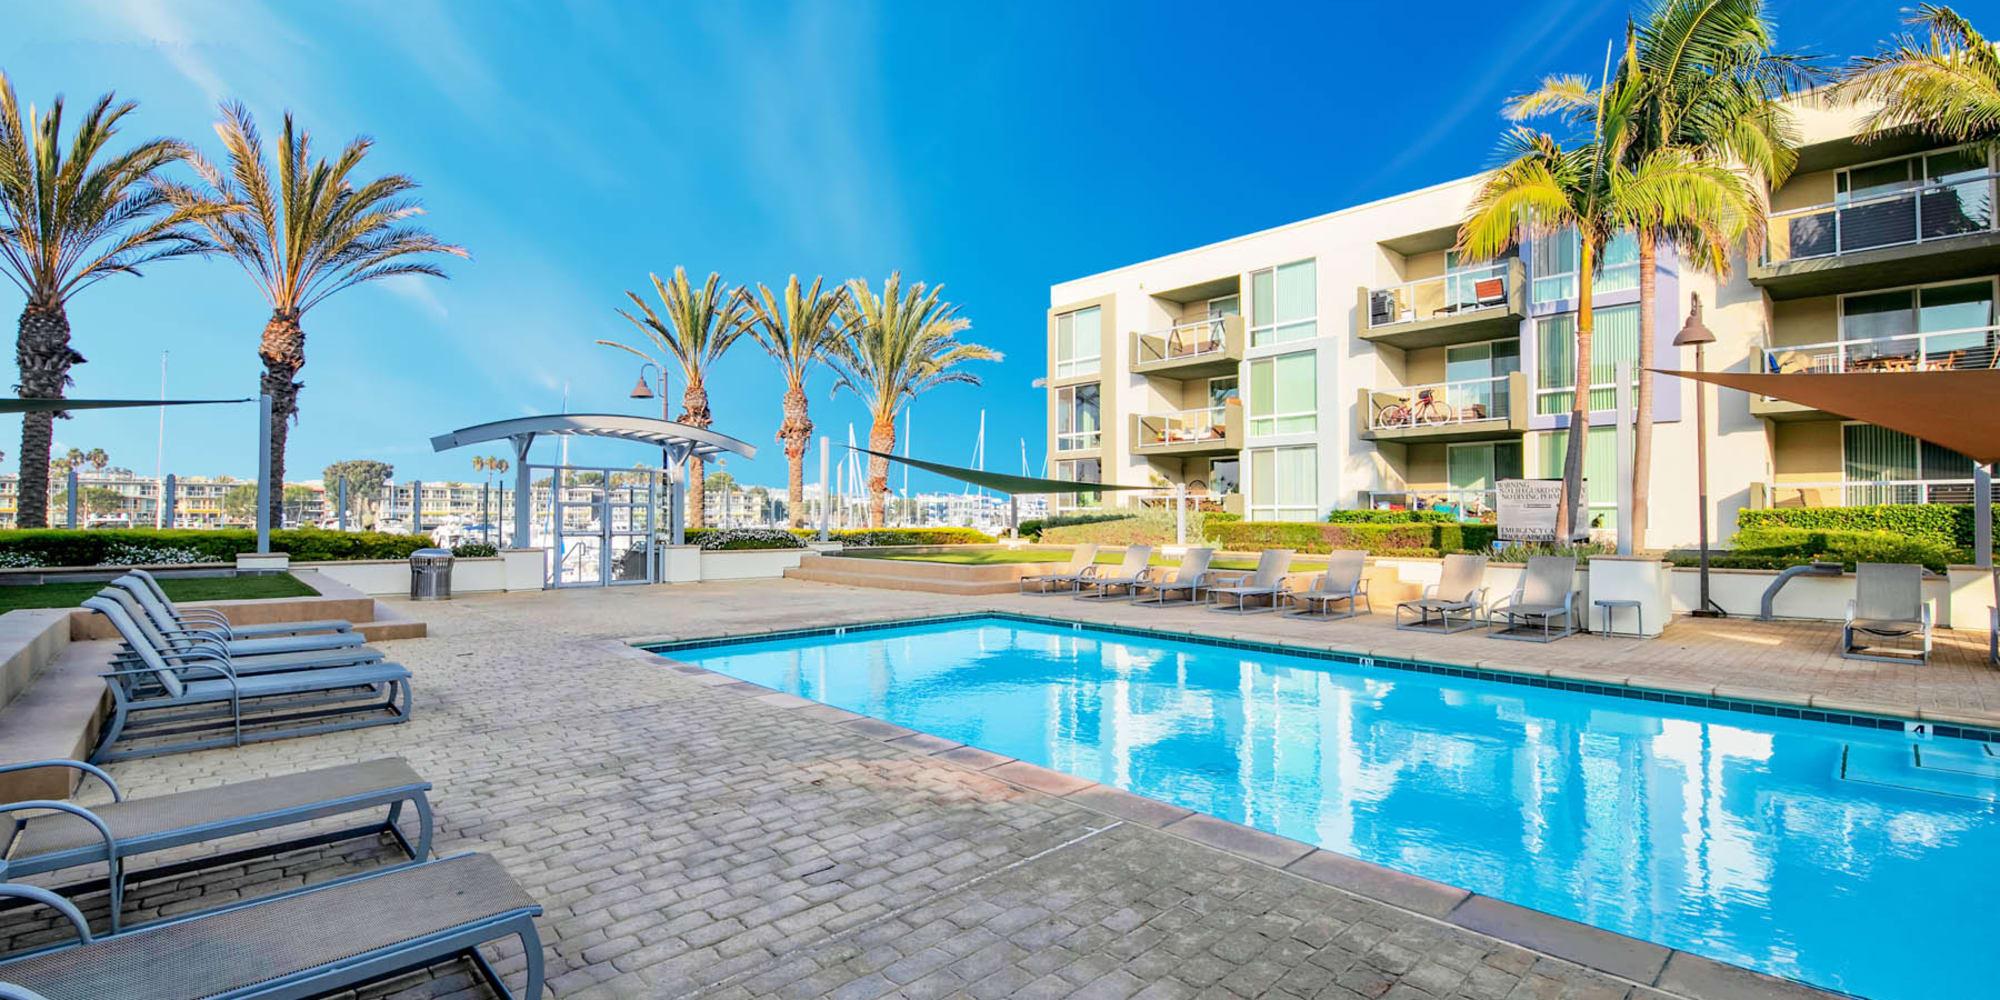 Resort-style swimming pool on a beautiful morning at Waters Edge at Marina Harbor in Marina Del Rey, California